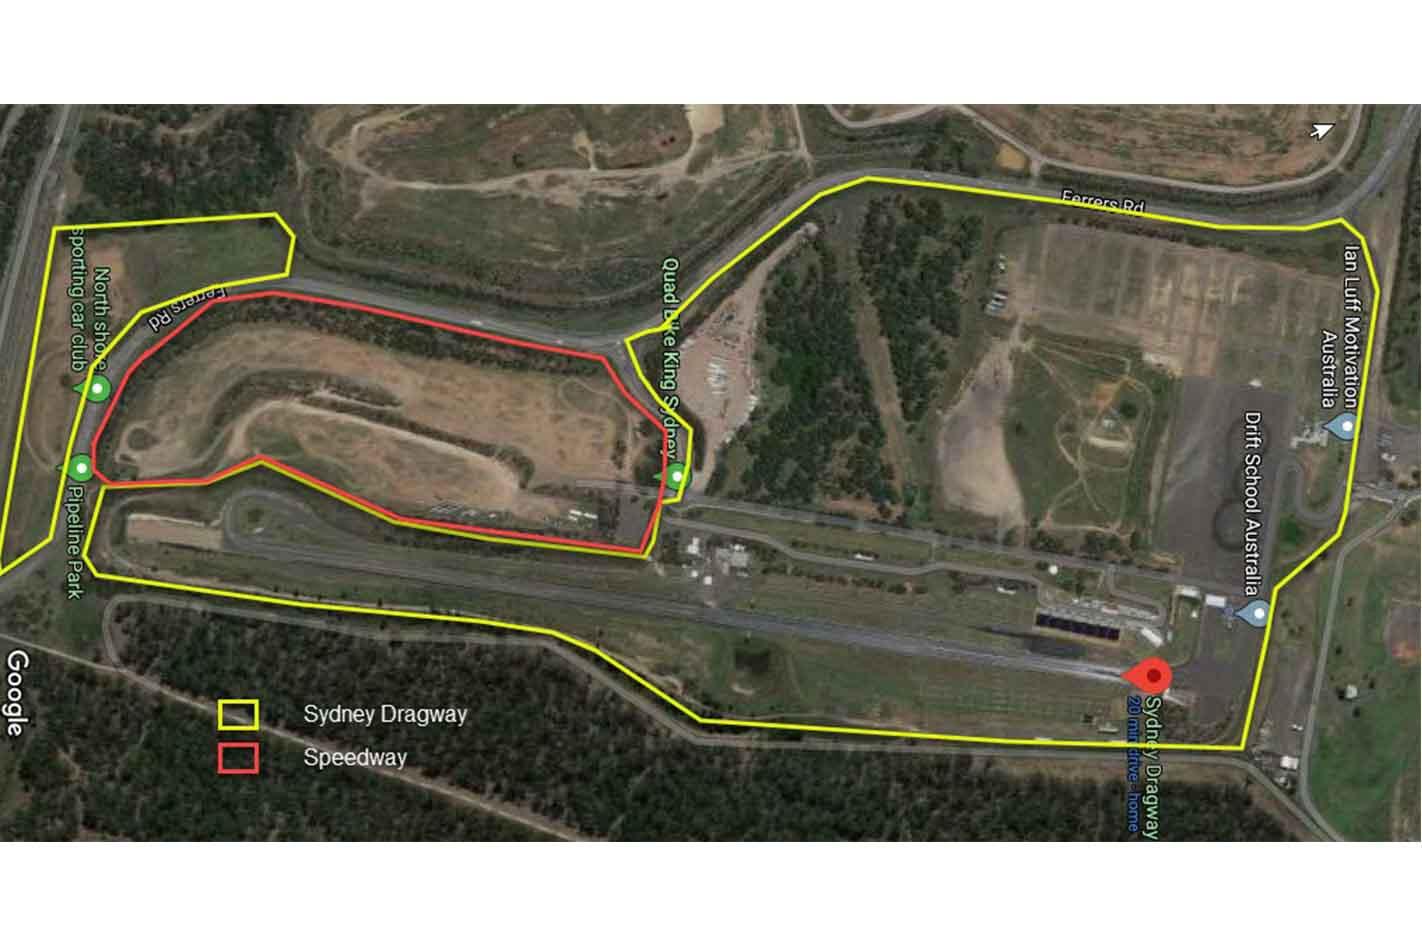 Sydney Dragway Speedway Jpg